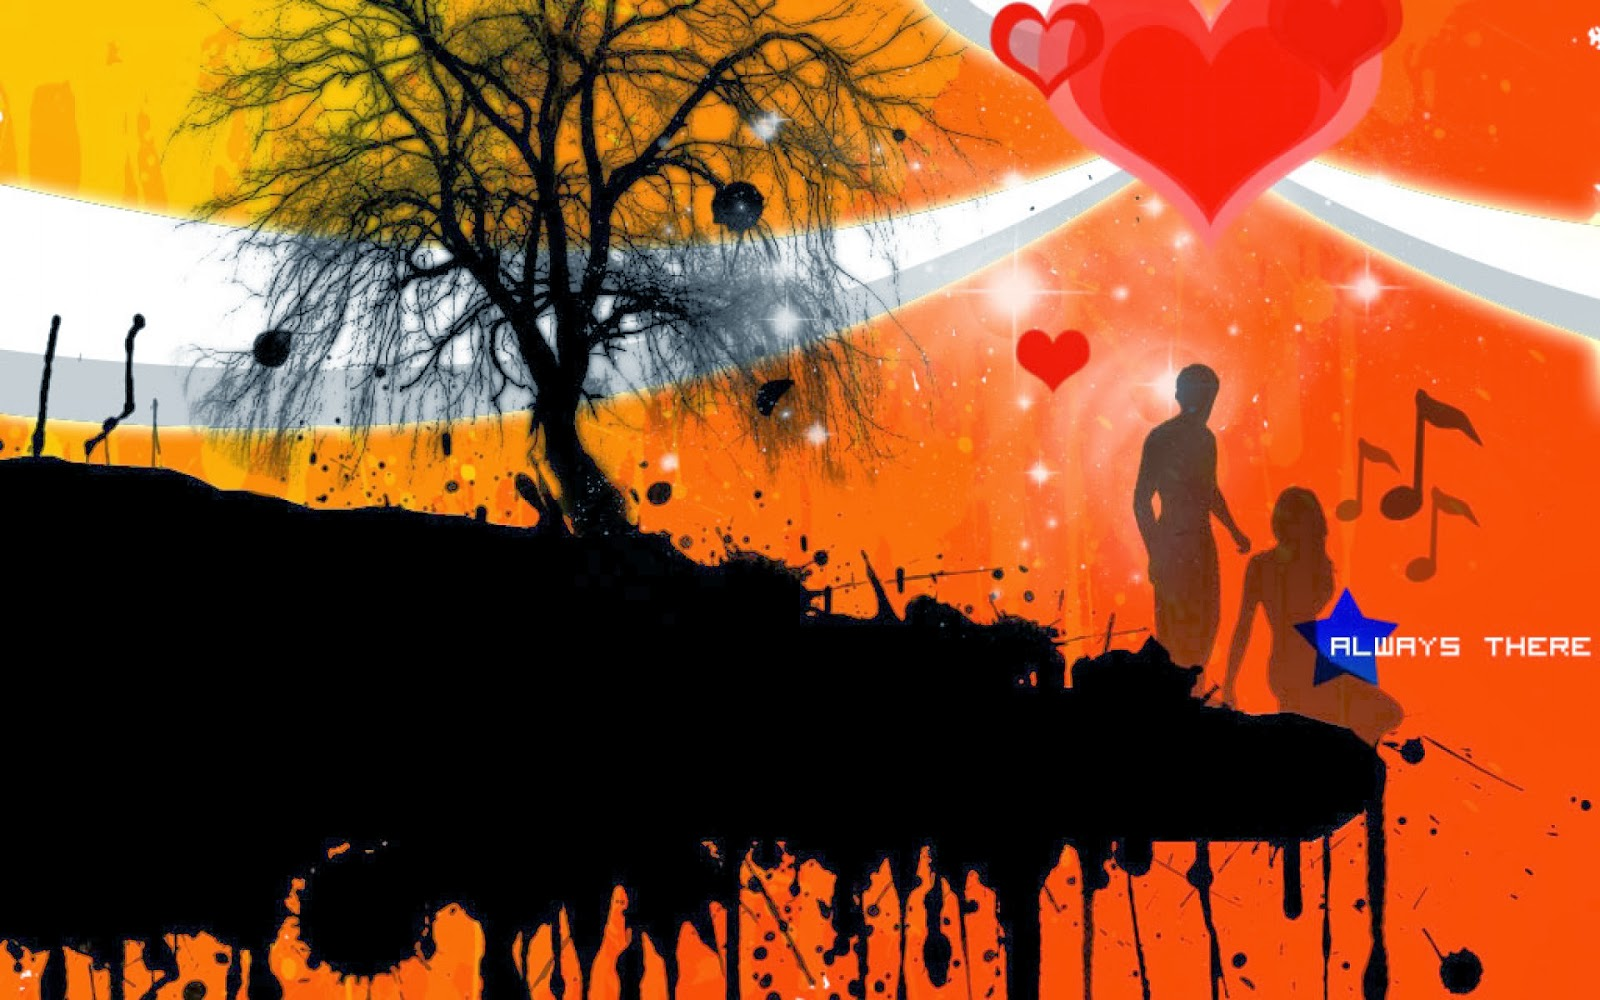 Love-music-design-wallpapers-download.jpg